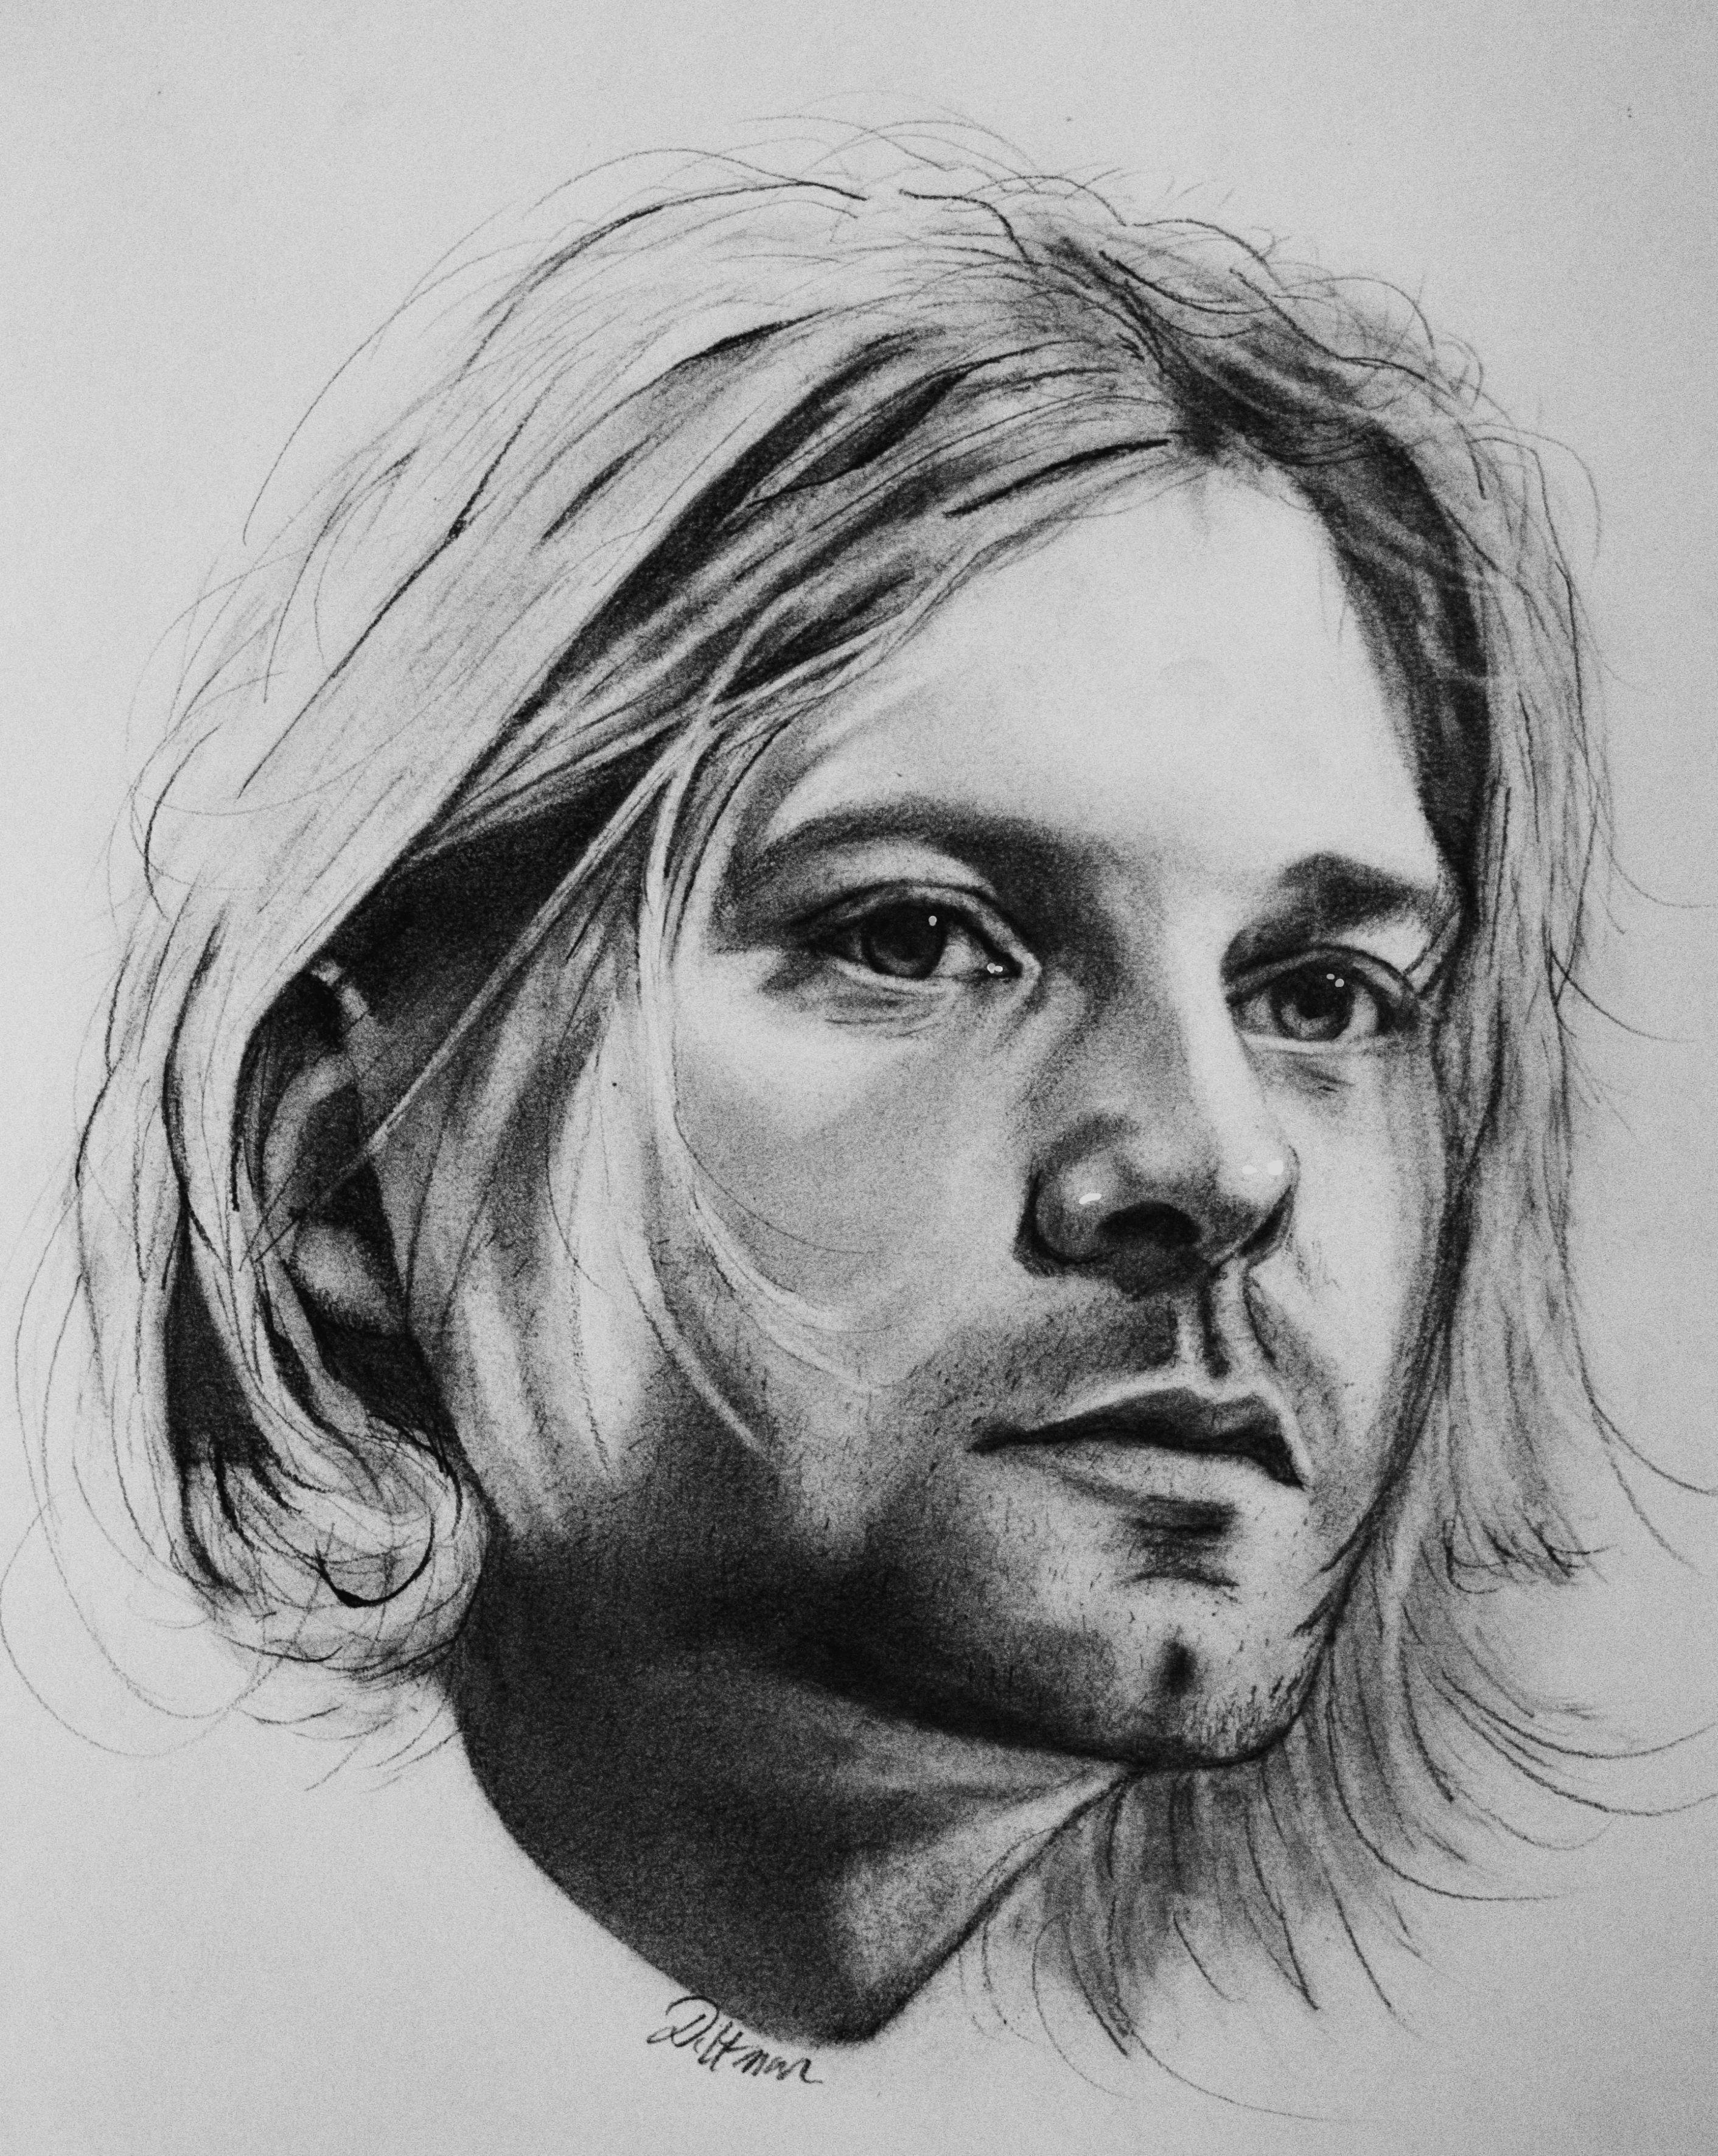 It's just a photo of Gargantuan Drawing Of Kurt Cobain